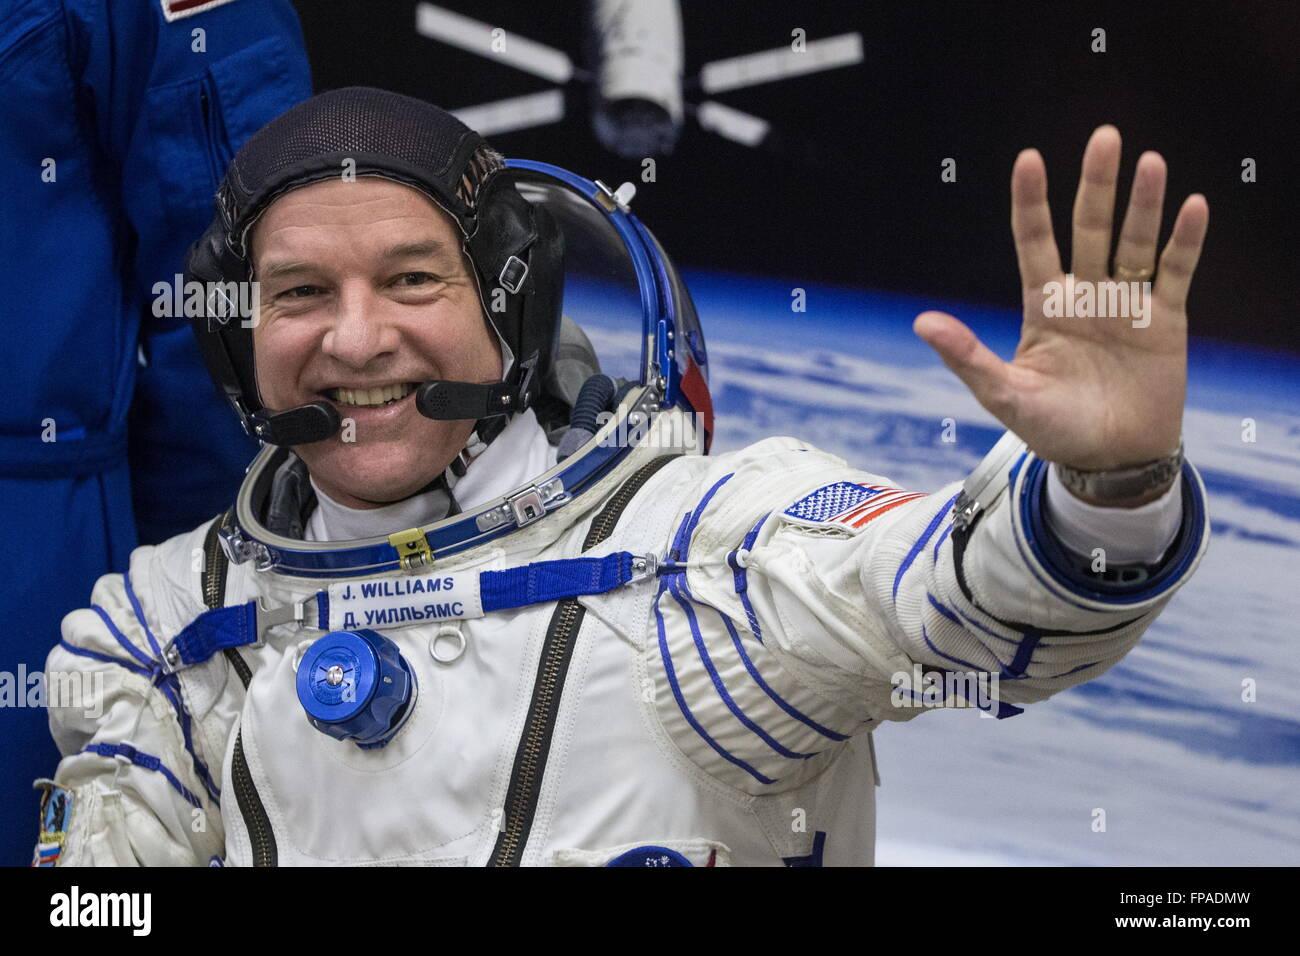 Baikonur, Kazakhstan. 18th Mar, 2016. Crew members of Expedition 47/48, NASA astronaut Jeffrey Jeff Williams waves - Stock Image